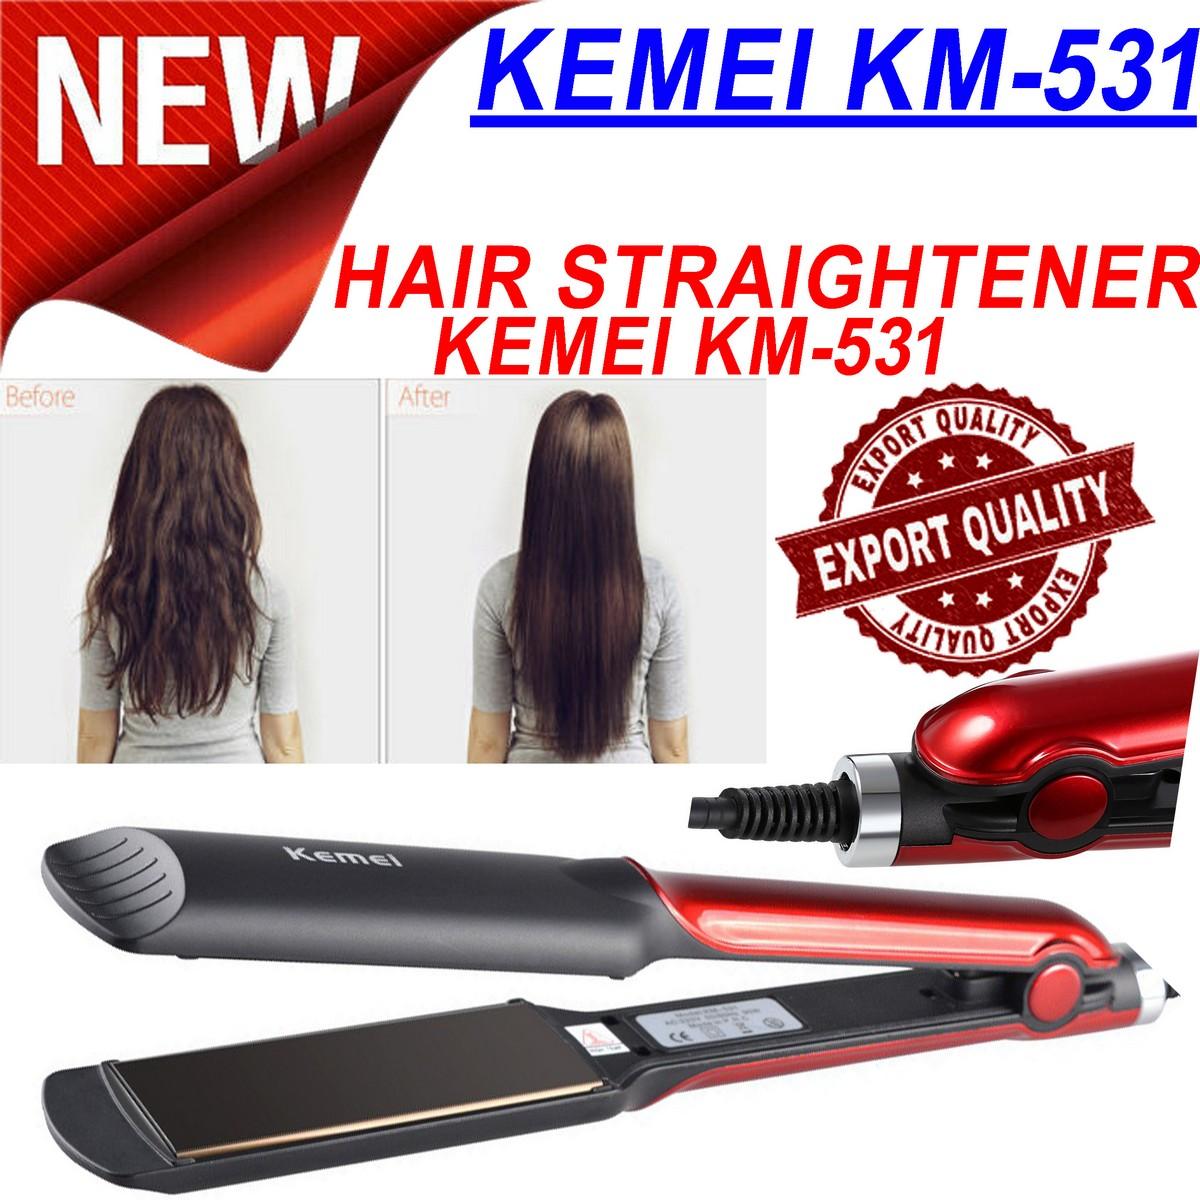 New KEMEI KM-531 Hair Straightener Ceramic Electric Professional Straighteners Flat iron Hair styling tool Beauty Set Rod for Women 30 sec Fast Ready Electric Straightening Machine Maximum 220C Genuine Original Best KM 531